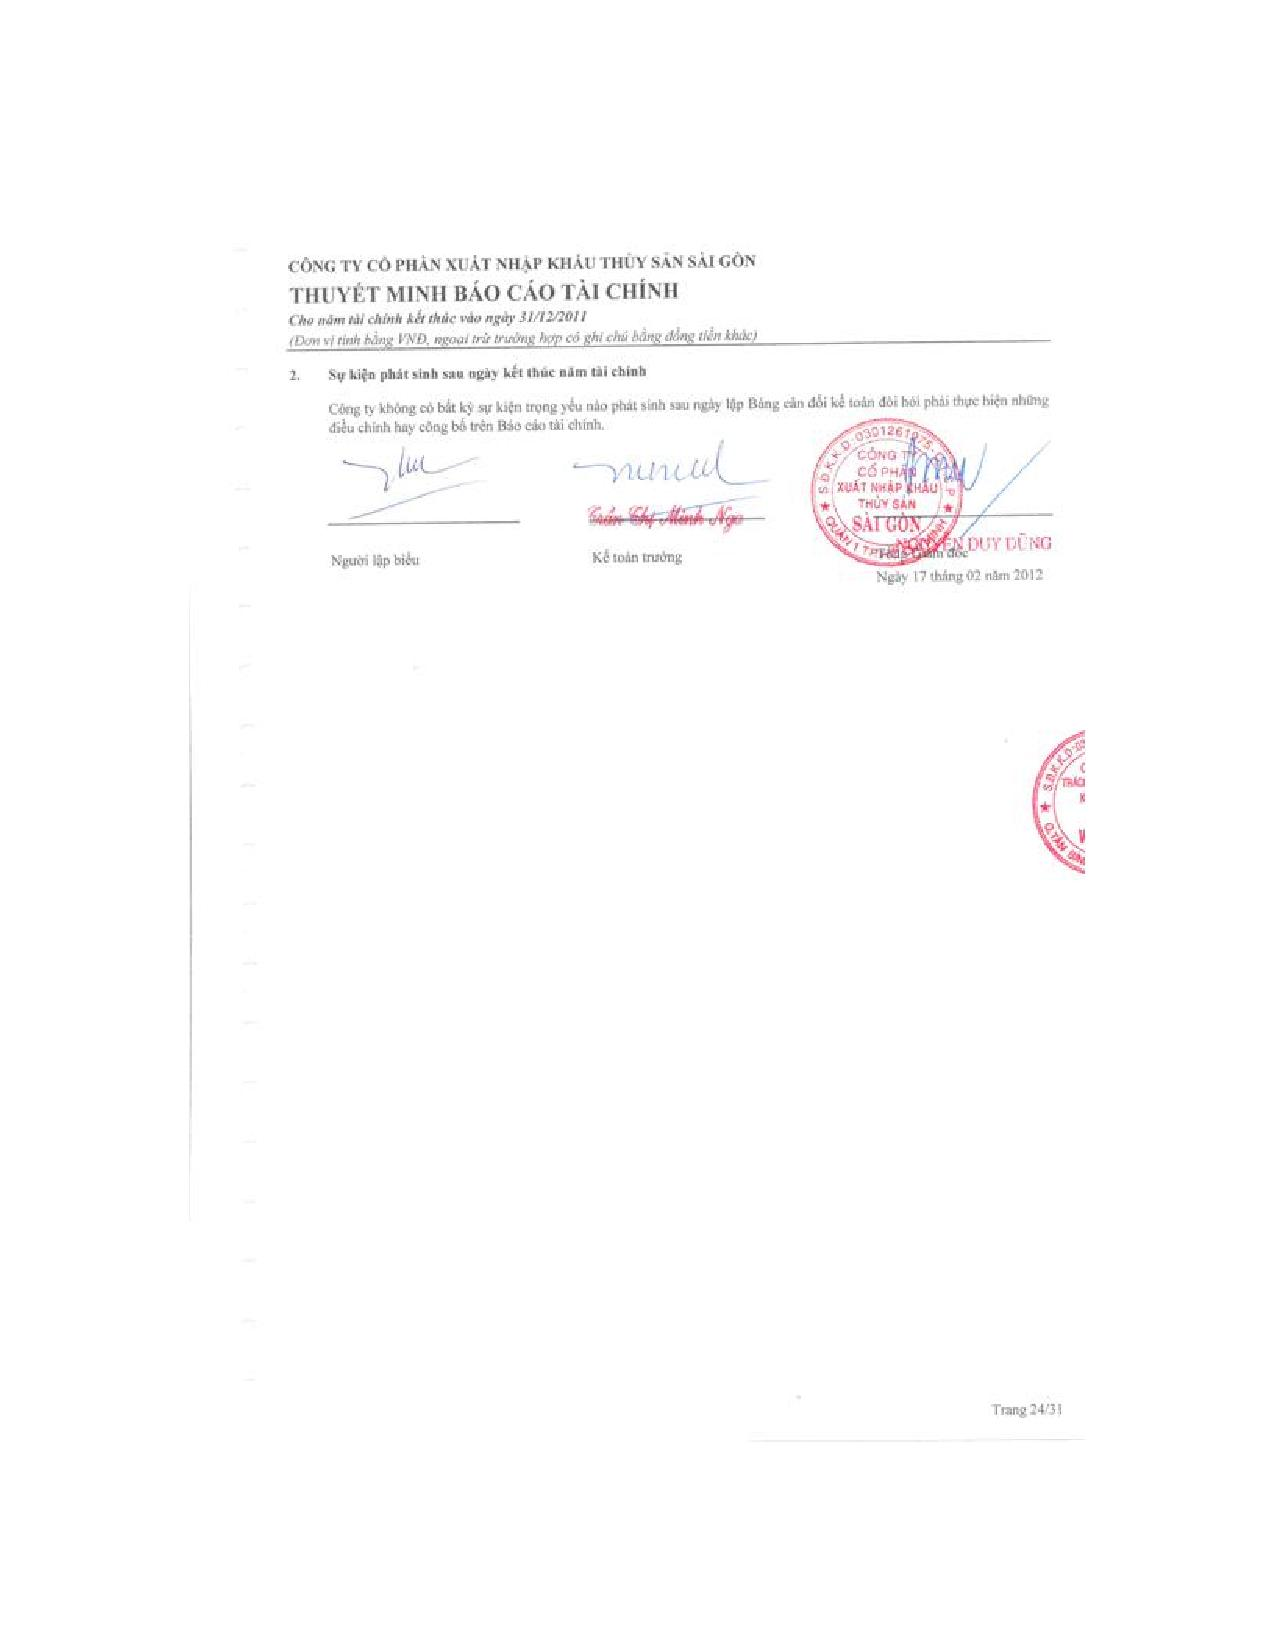 2342012234_Bao-Cao-Tai-Chanh-2011-Seaprodex-Saigon-Da-kiem-toan-page-026